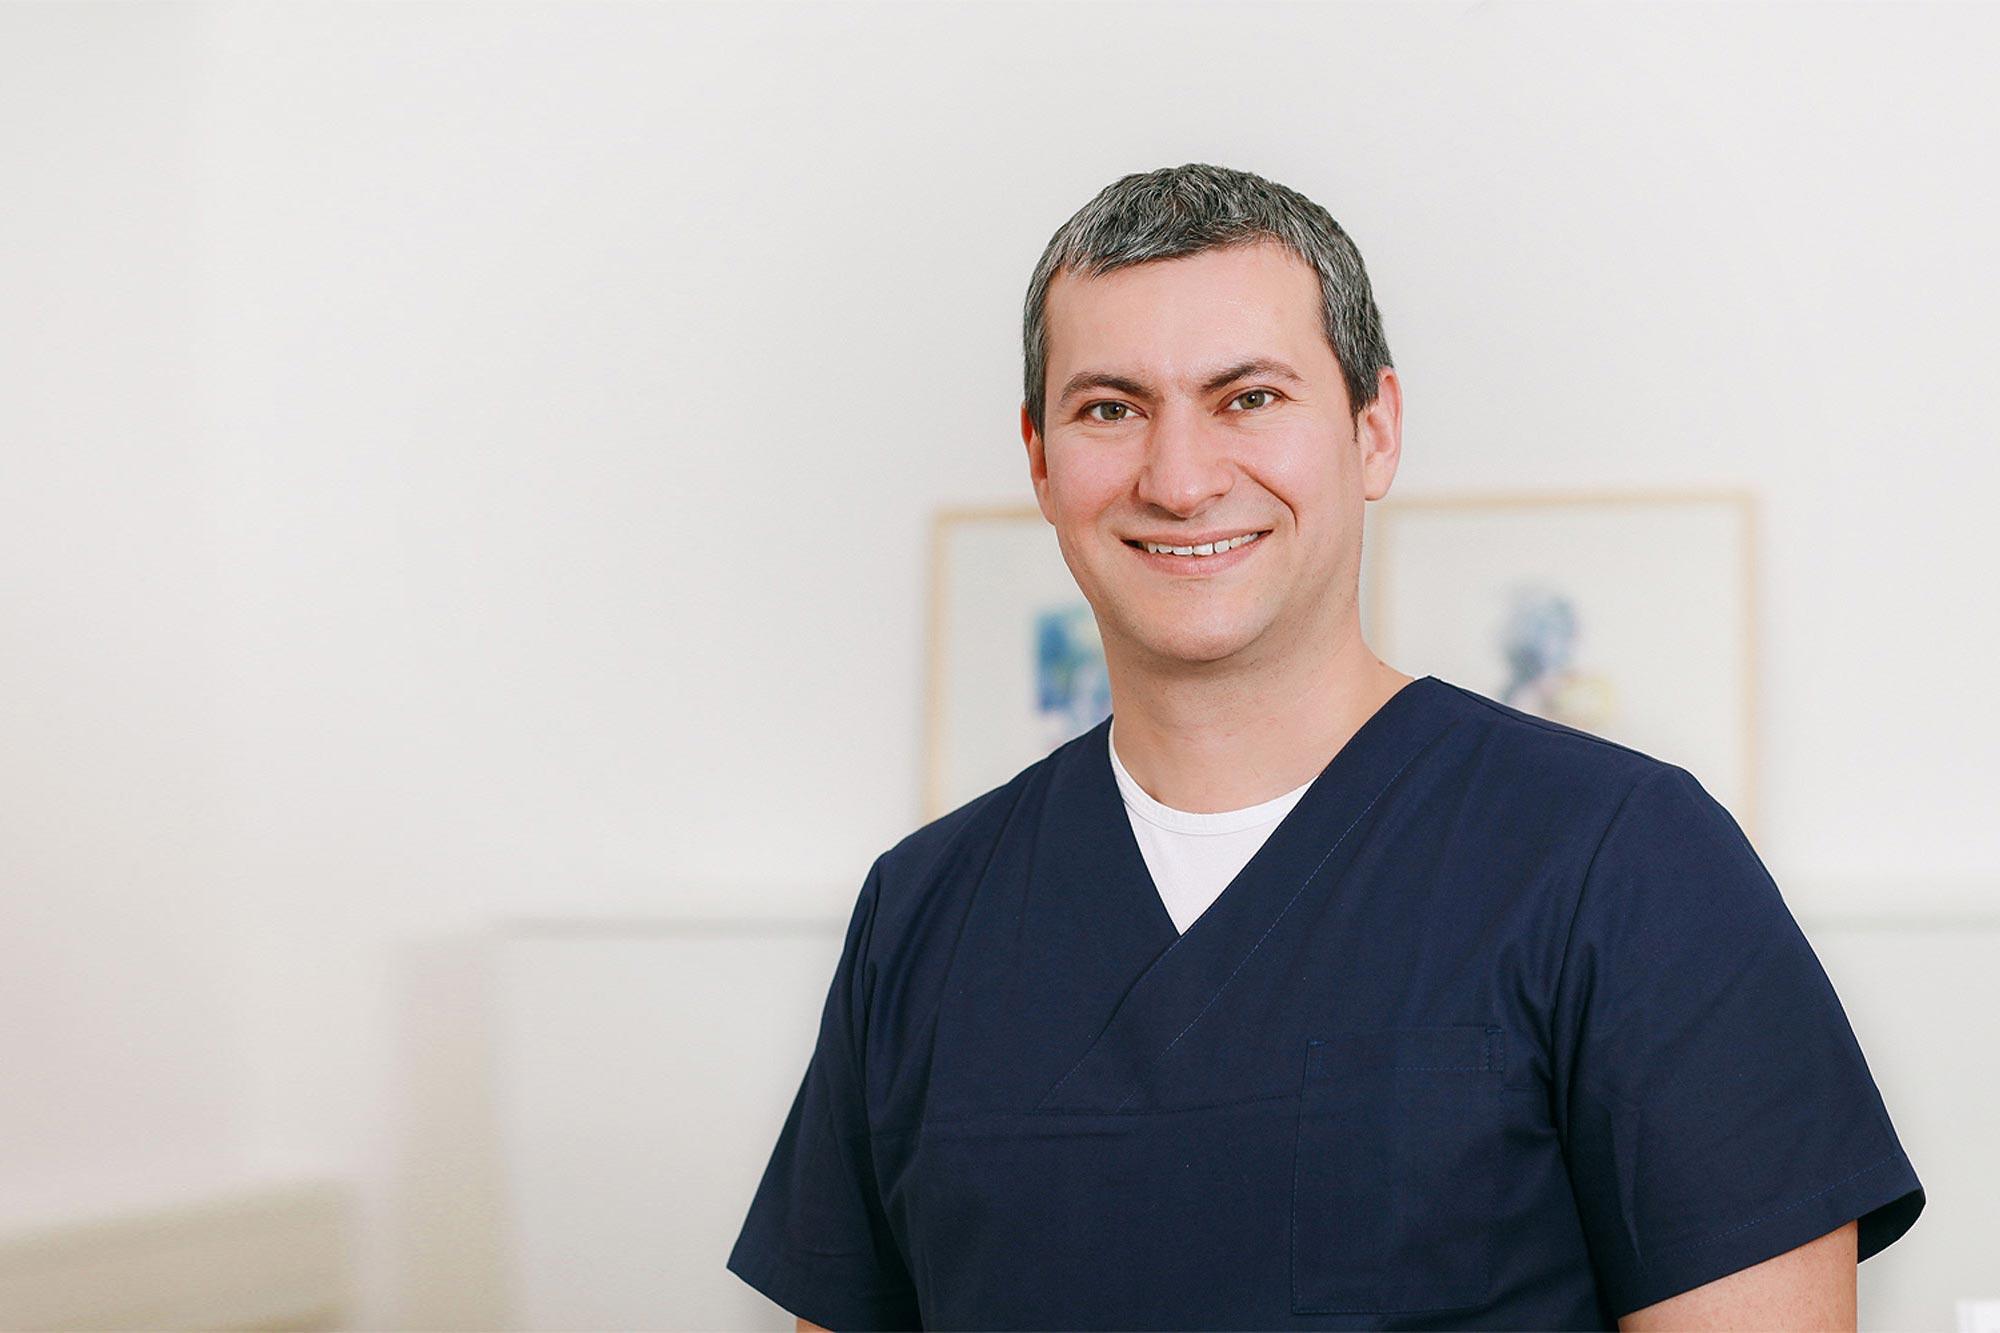 Erfreut Mundchirurg Zahnarzthelfer Lebenslauf Fotos - Entry Level ...